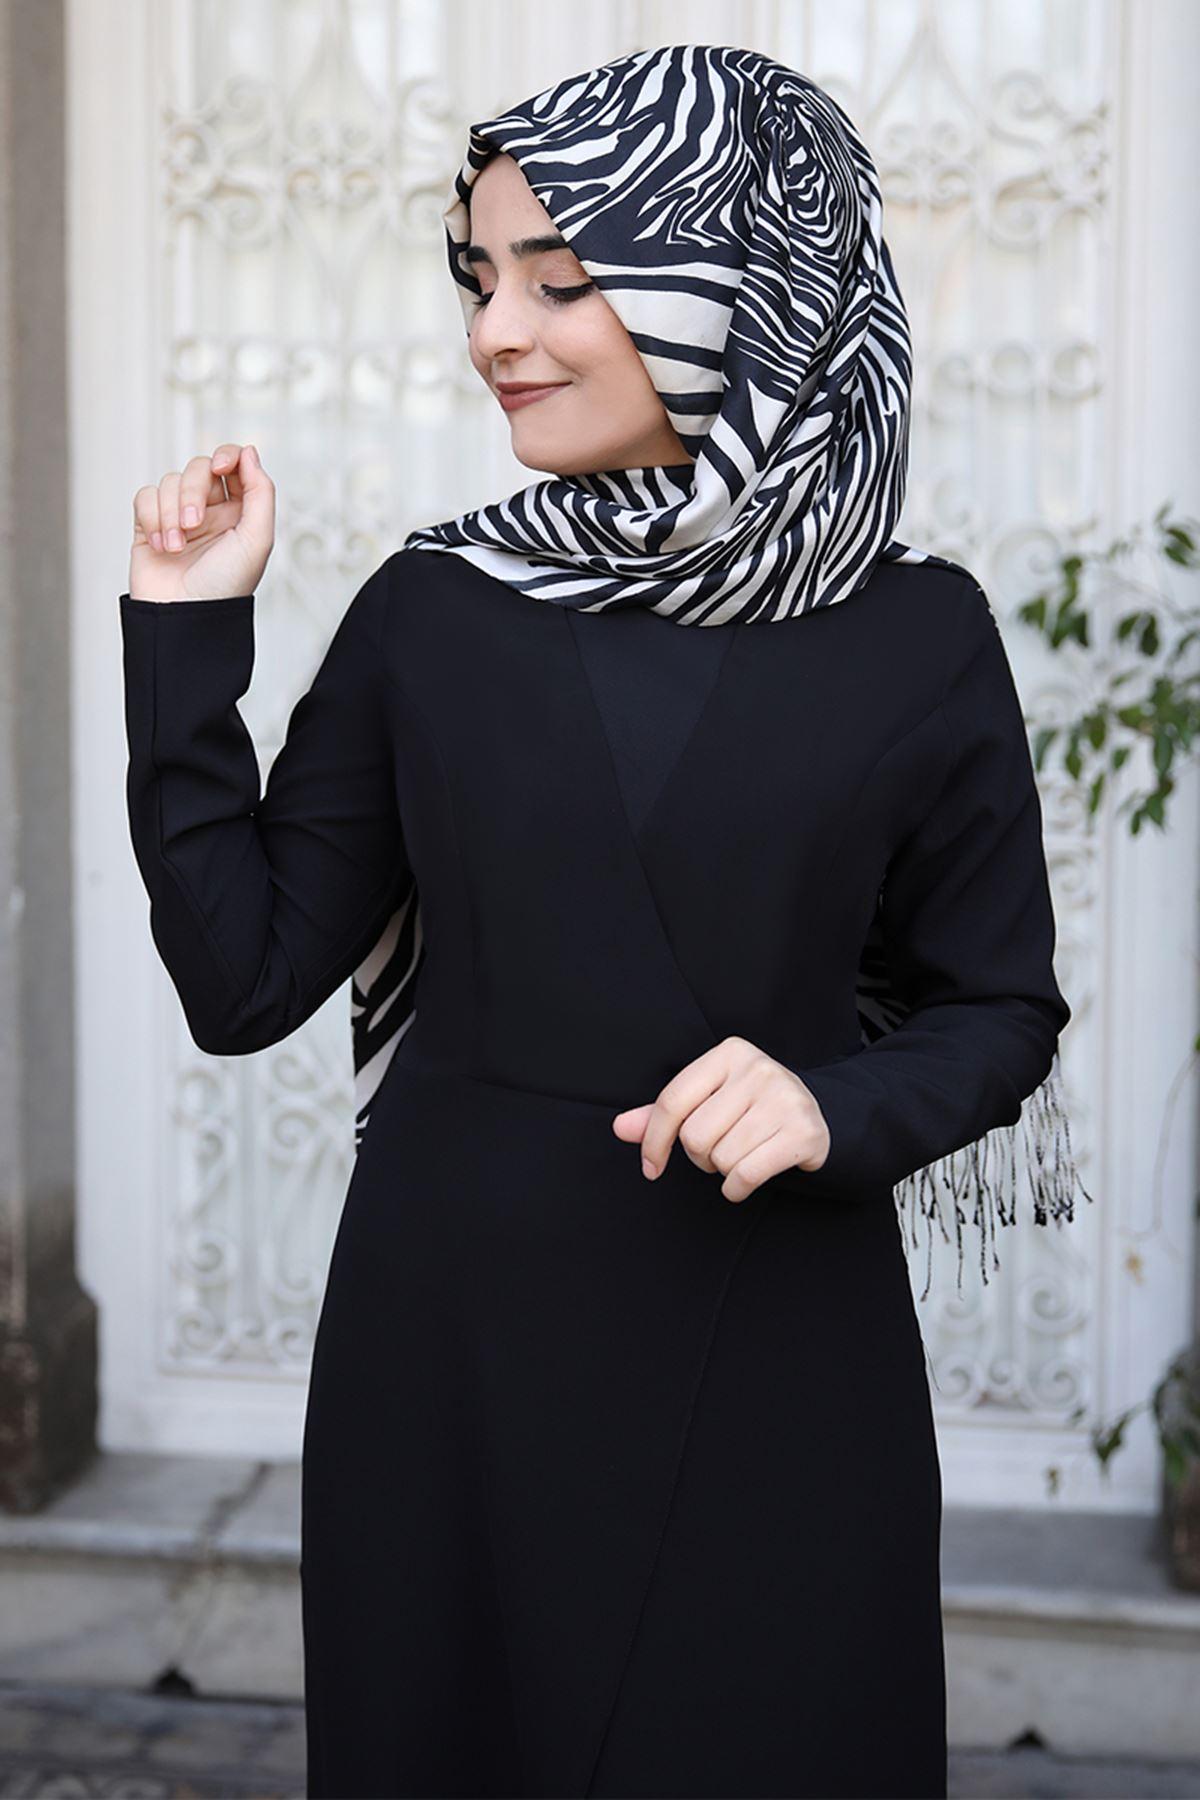 Sümay Zarif Tulum Siyah SÜM5013